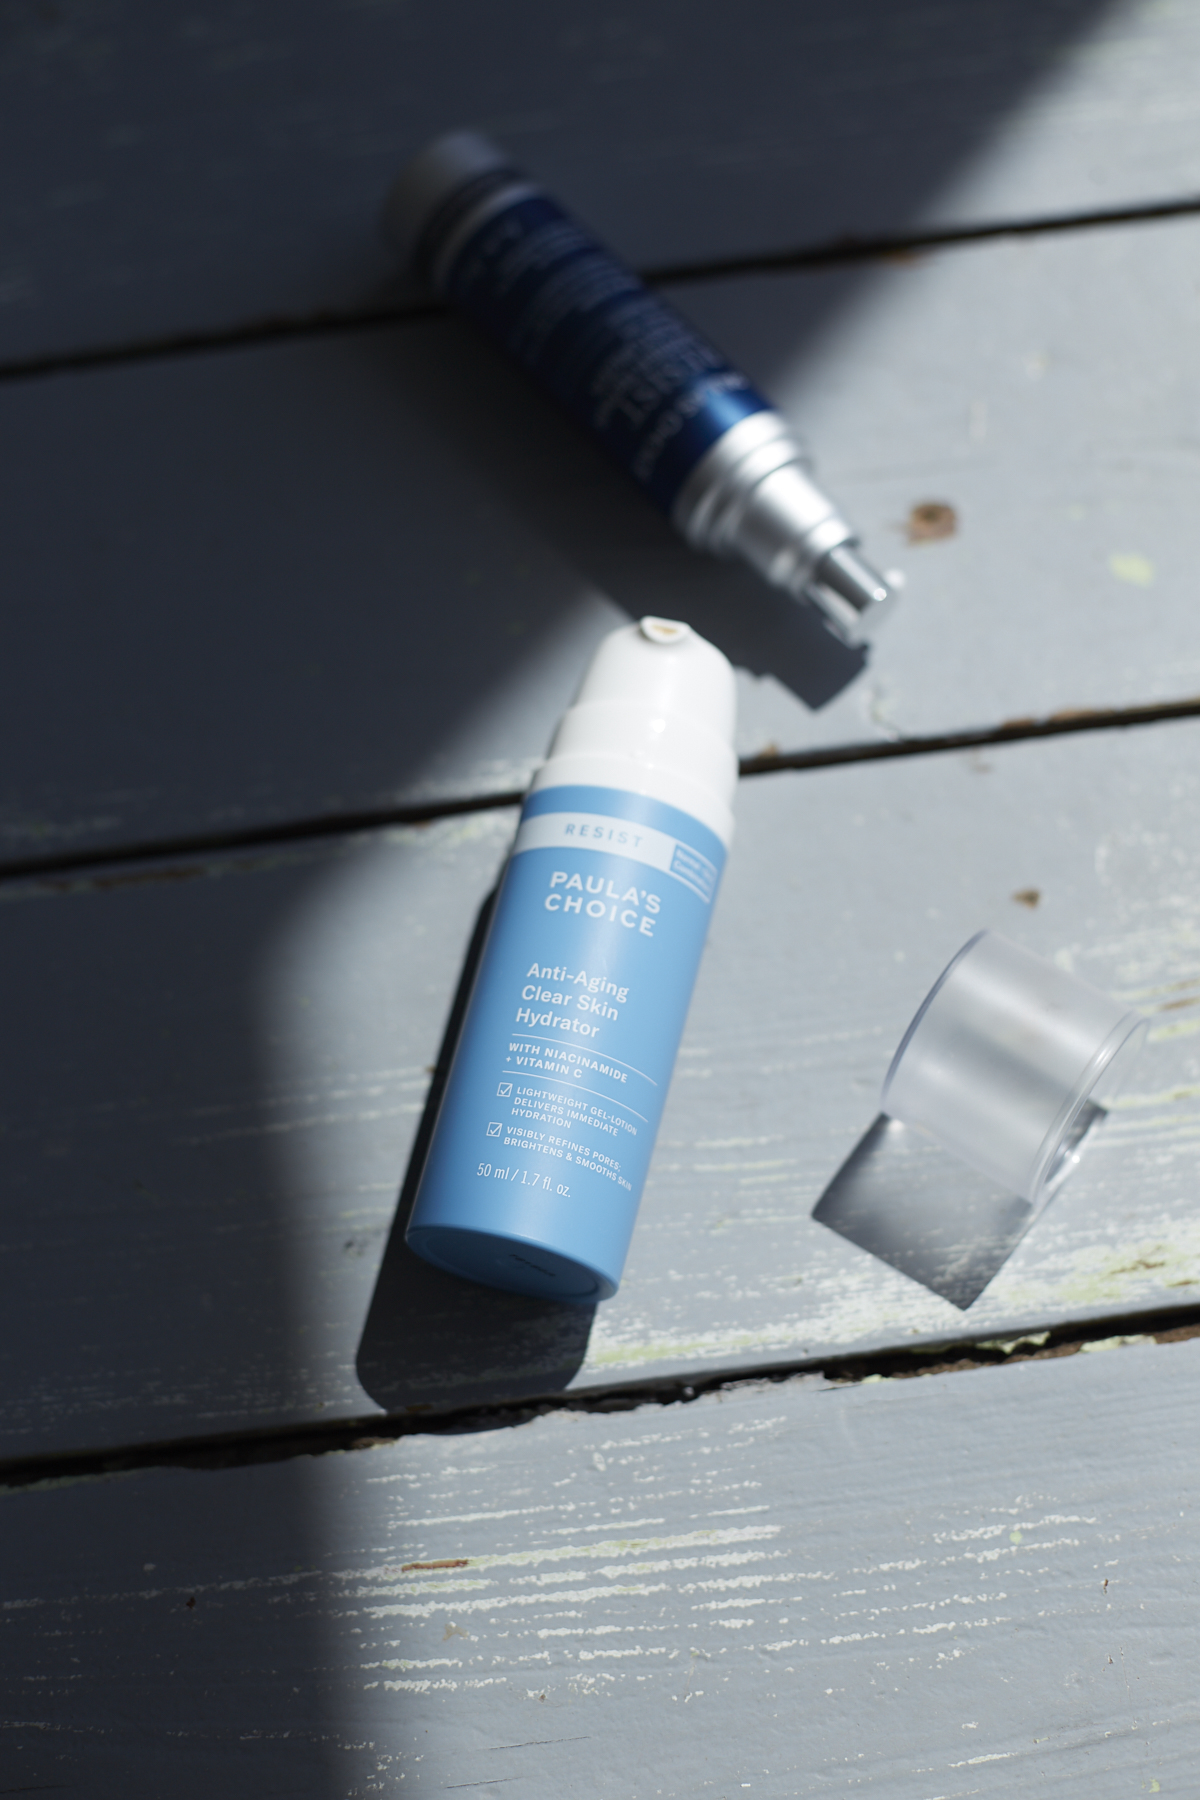 Paula's Choice Anti-Aging Clear Skin Hydrator